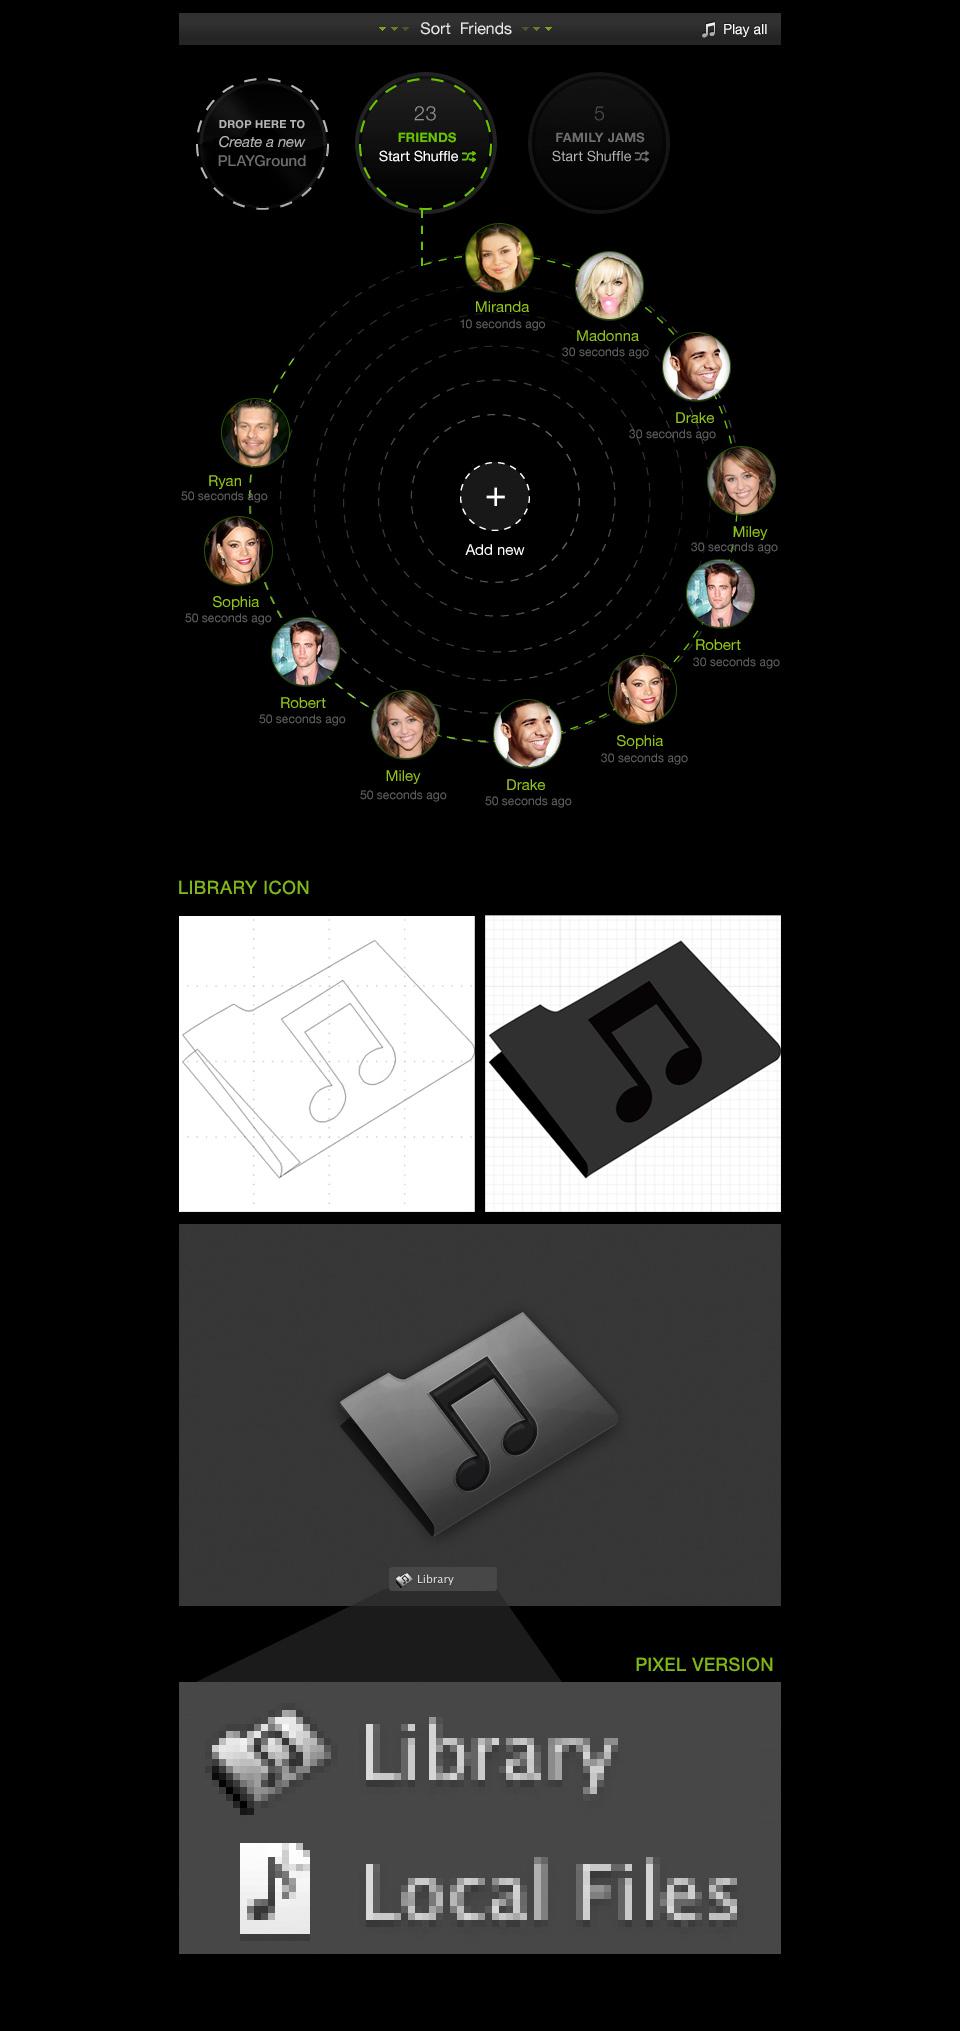 behance_spotify3.jpg